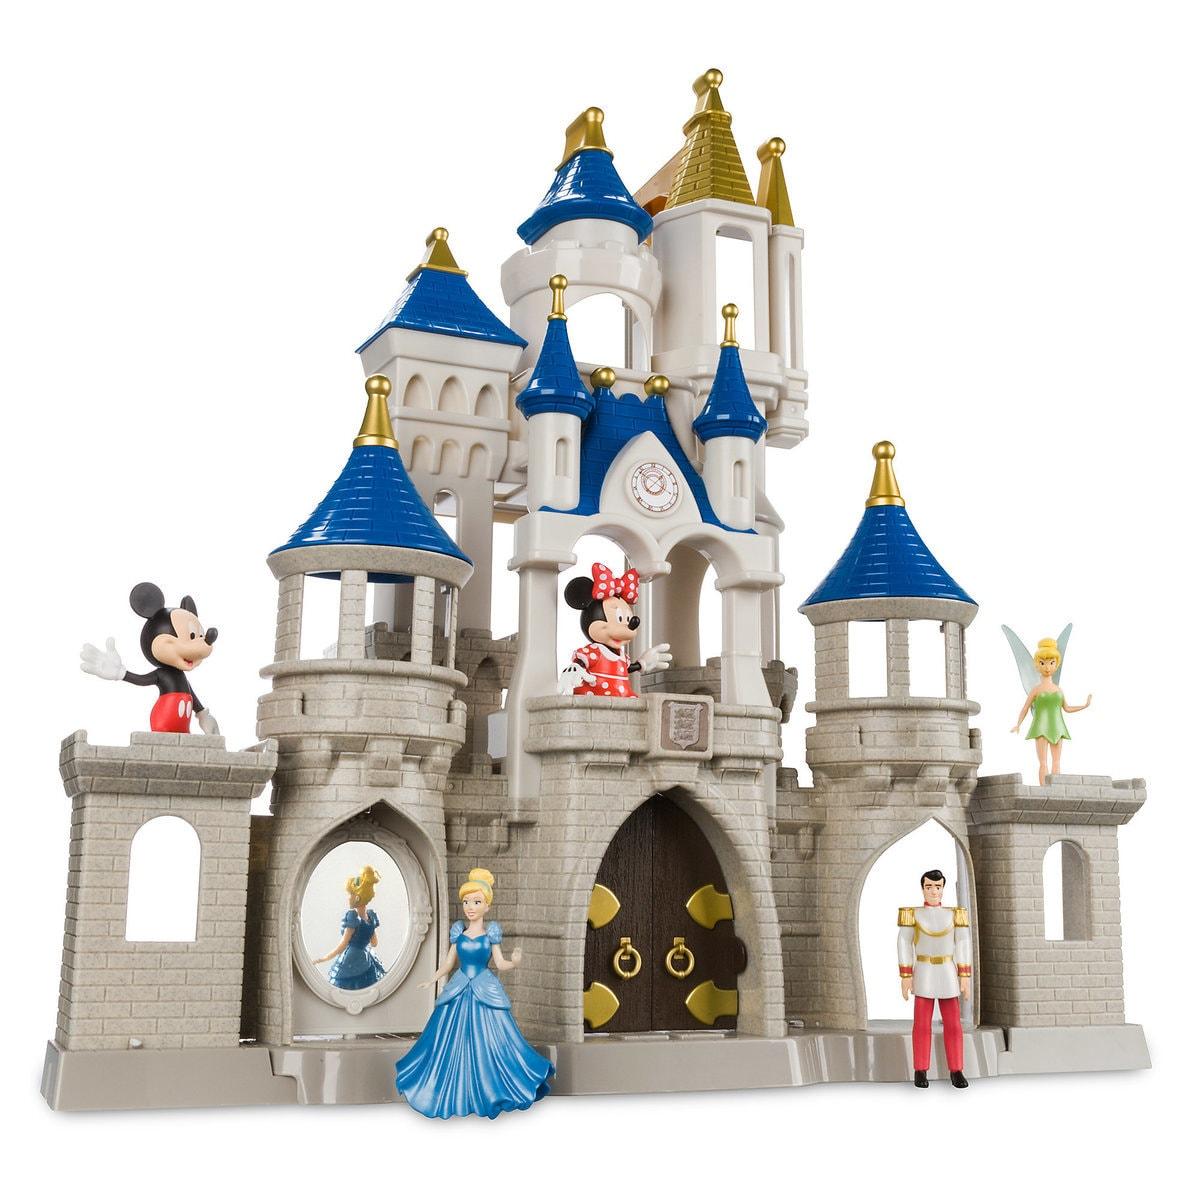 Product Image of Cinderella Castle Play Set - Walt Disney World # 1